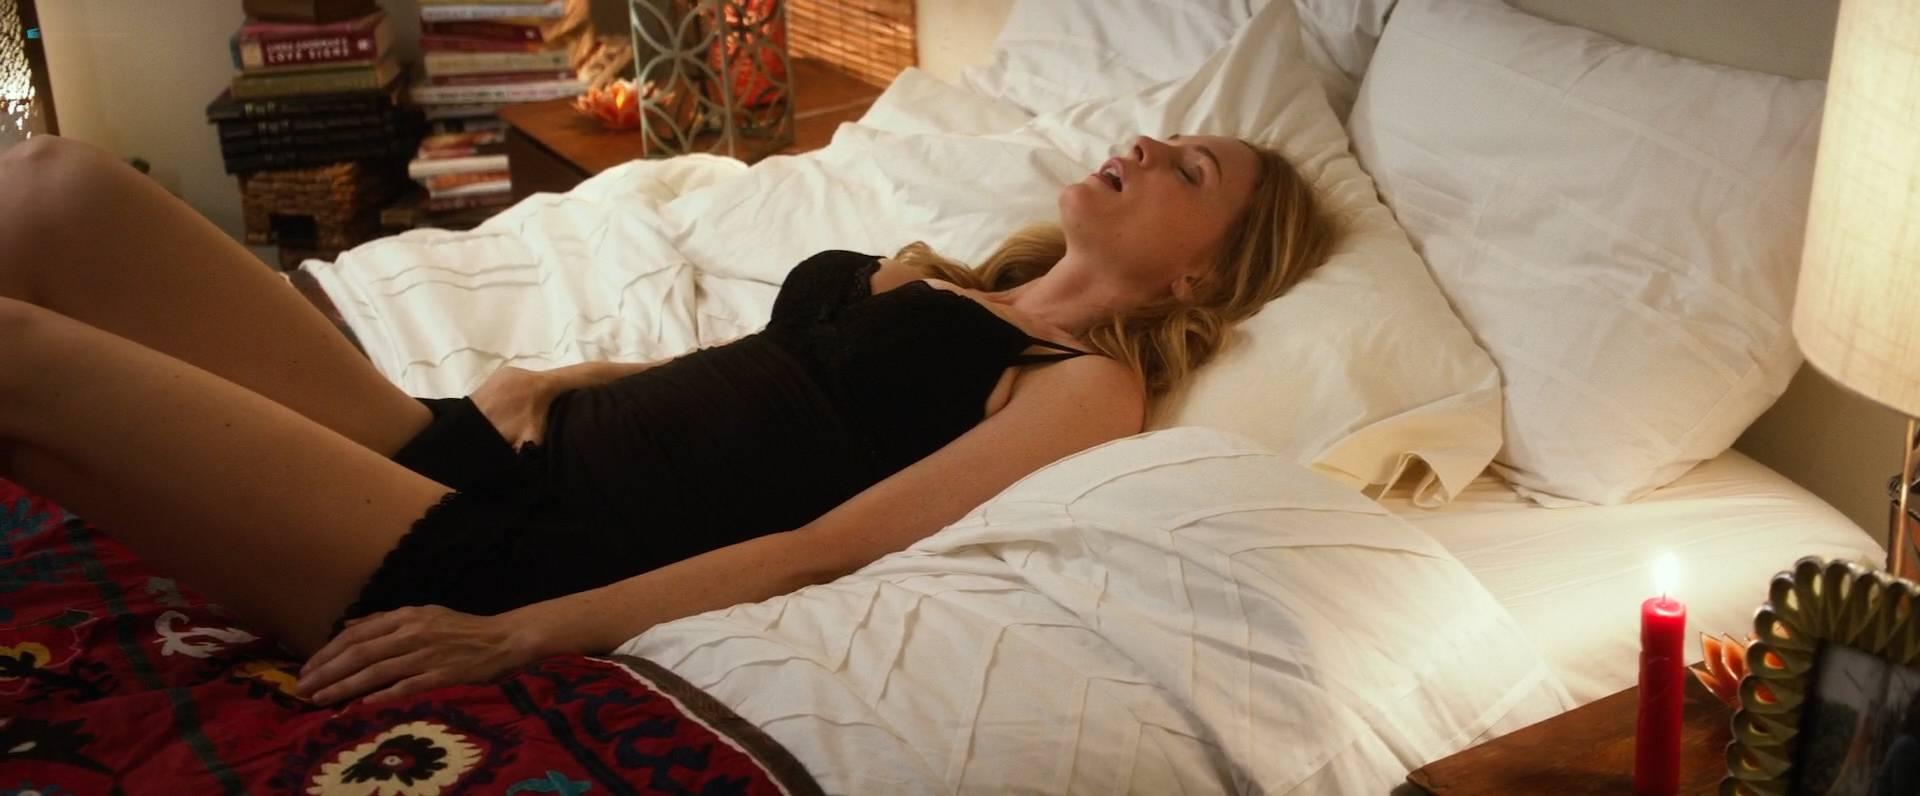 Angela Kinsey Nude Scene download sex pics heather graham nude sex angela kinsey nude